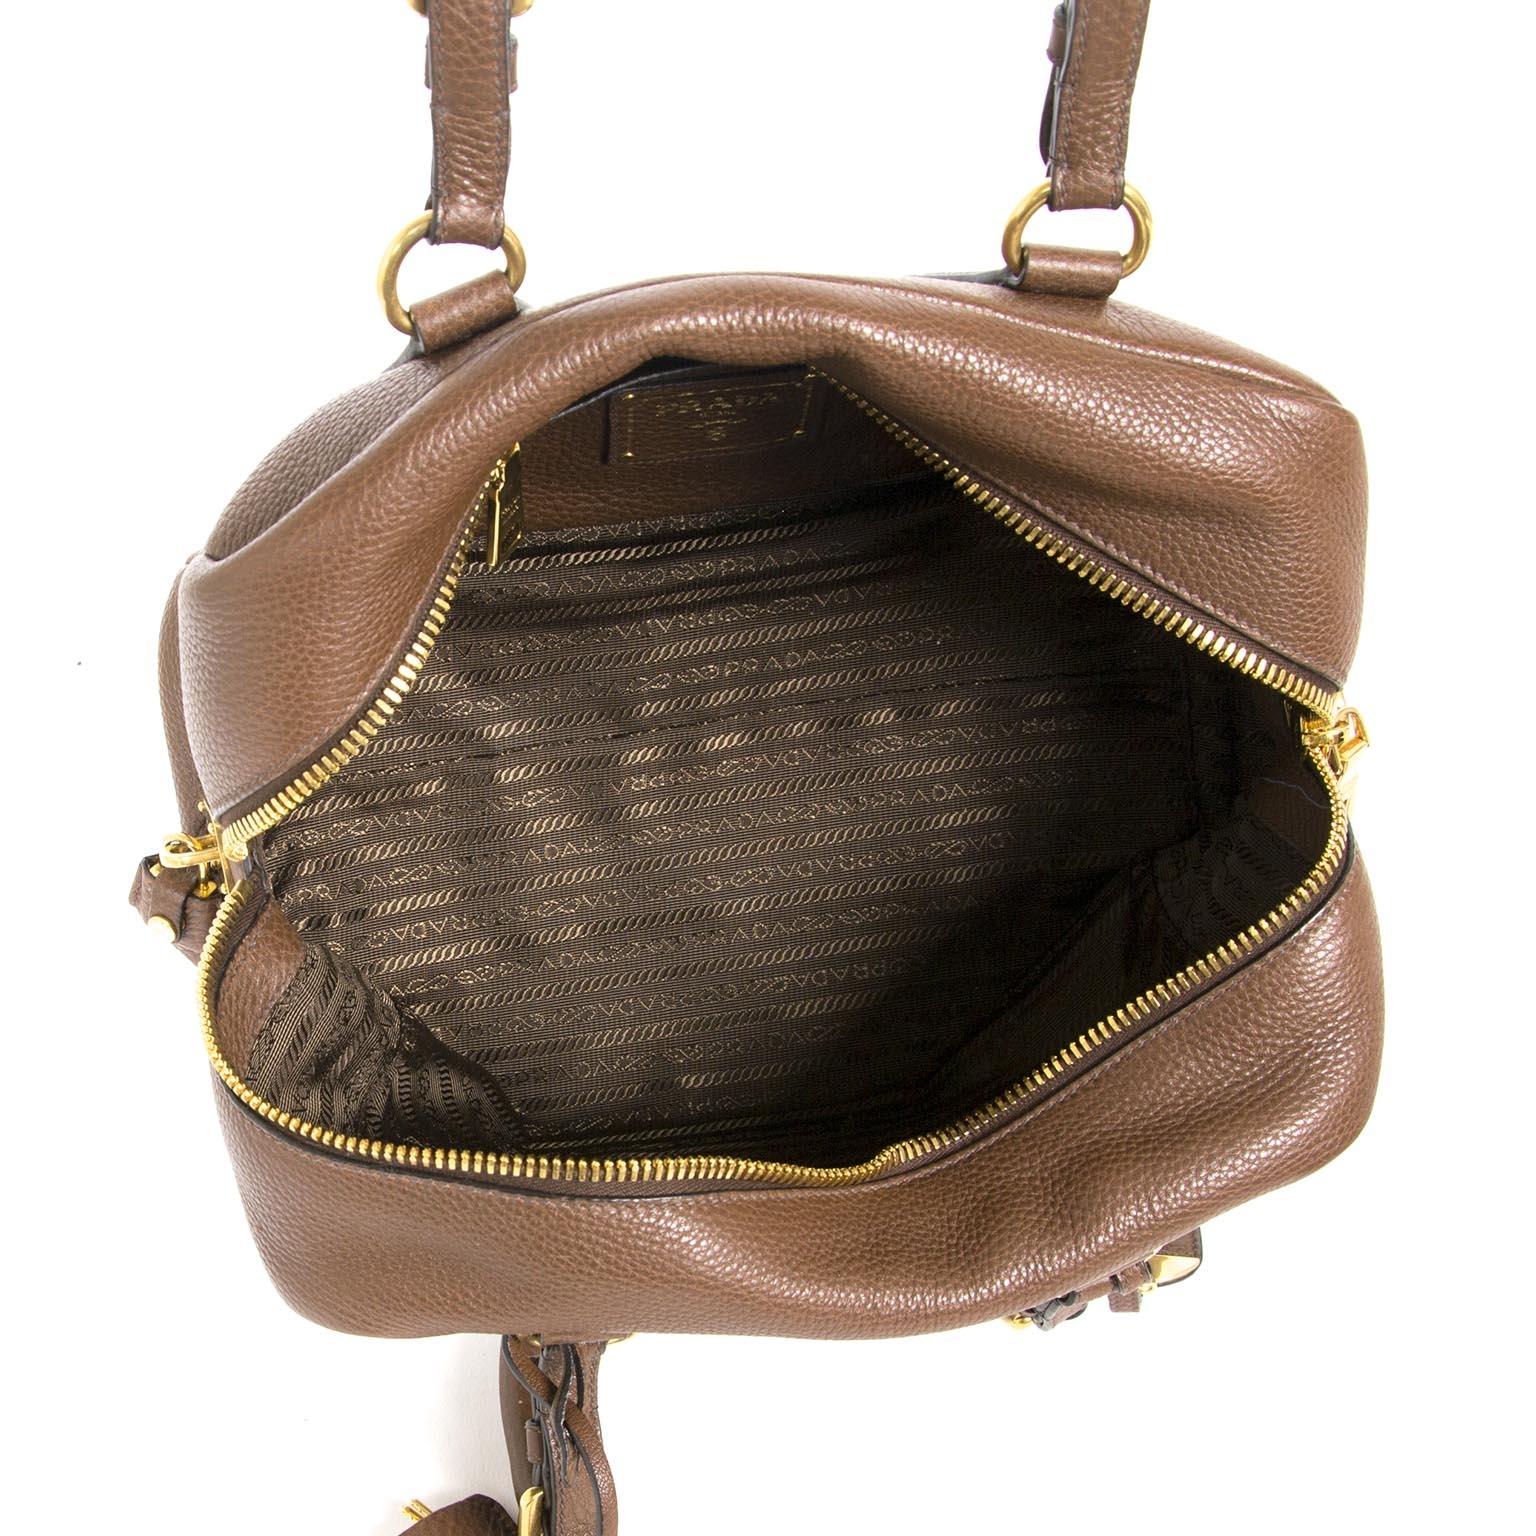 9fb111234a39 Labellov Buy authentic vintagePrada designer bags, shoes, clothes ...